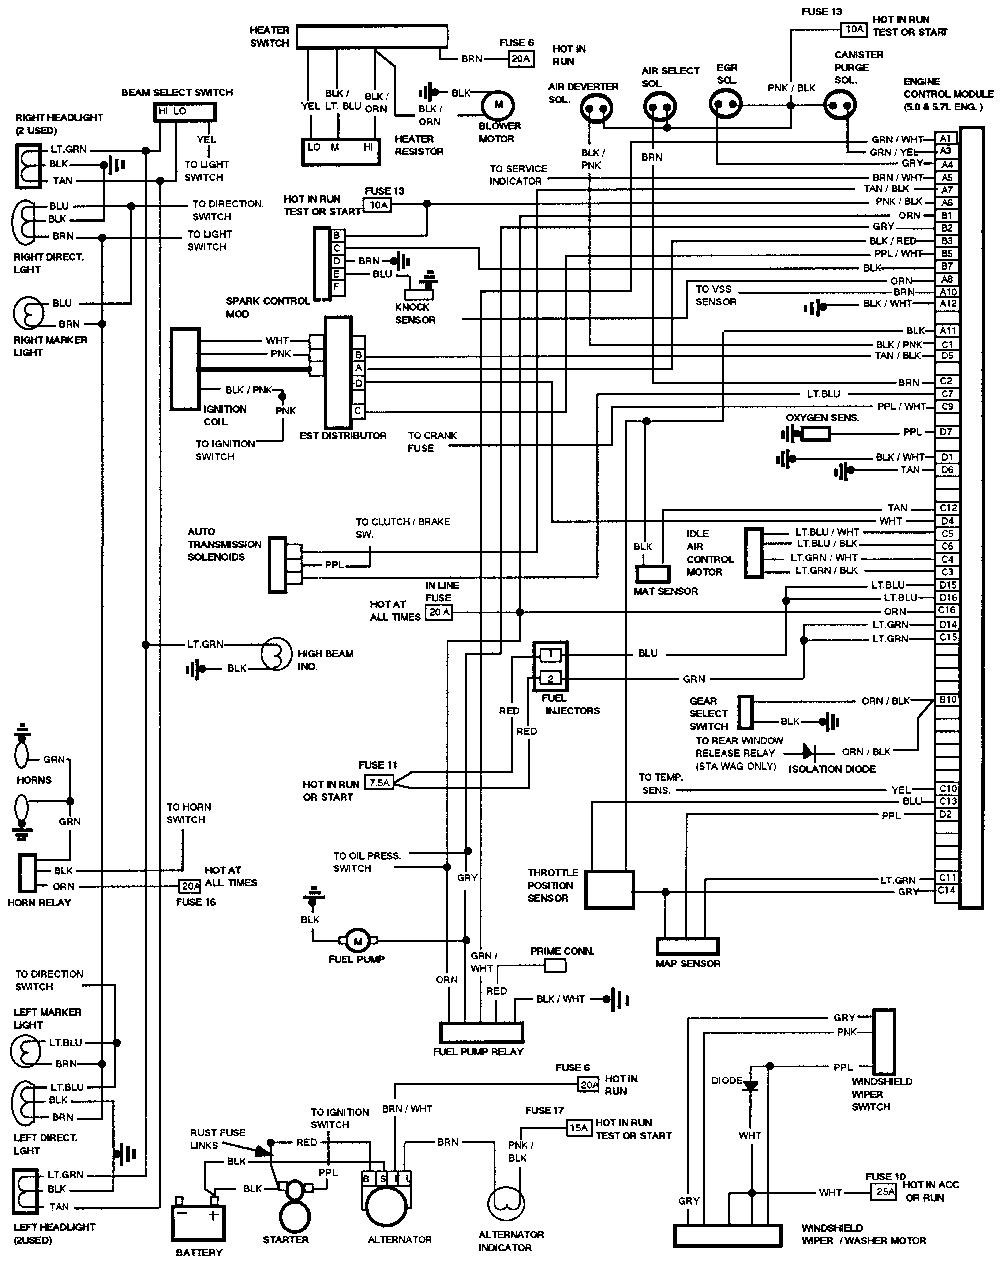 medium resolution of  4l60e pinout diagram on cd4e wiring diagram turbo 400 wiring diagram 5r55s wiring diagram